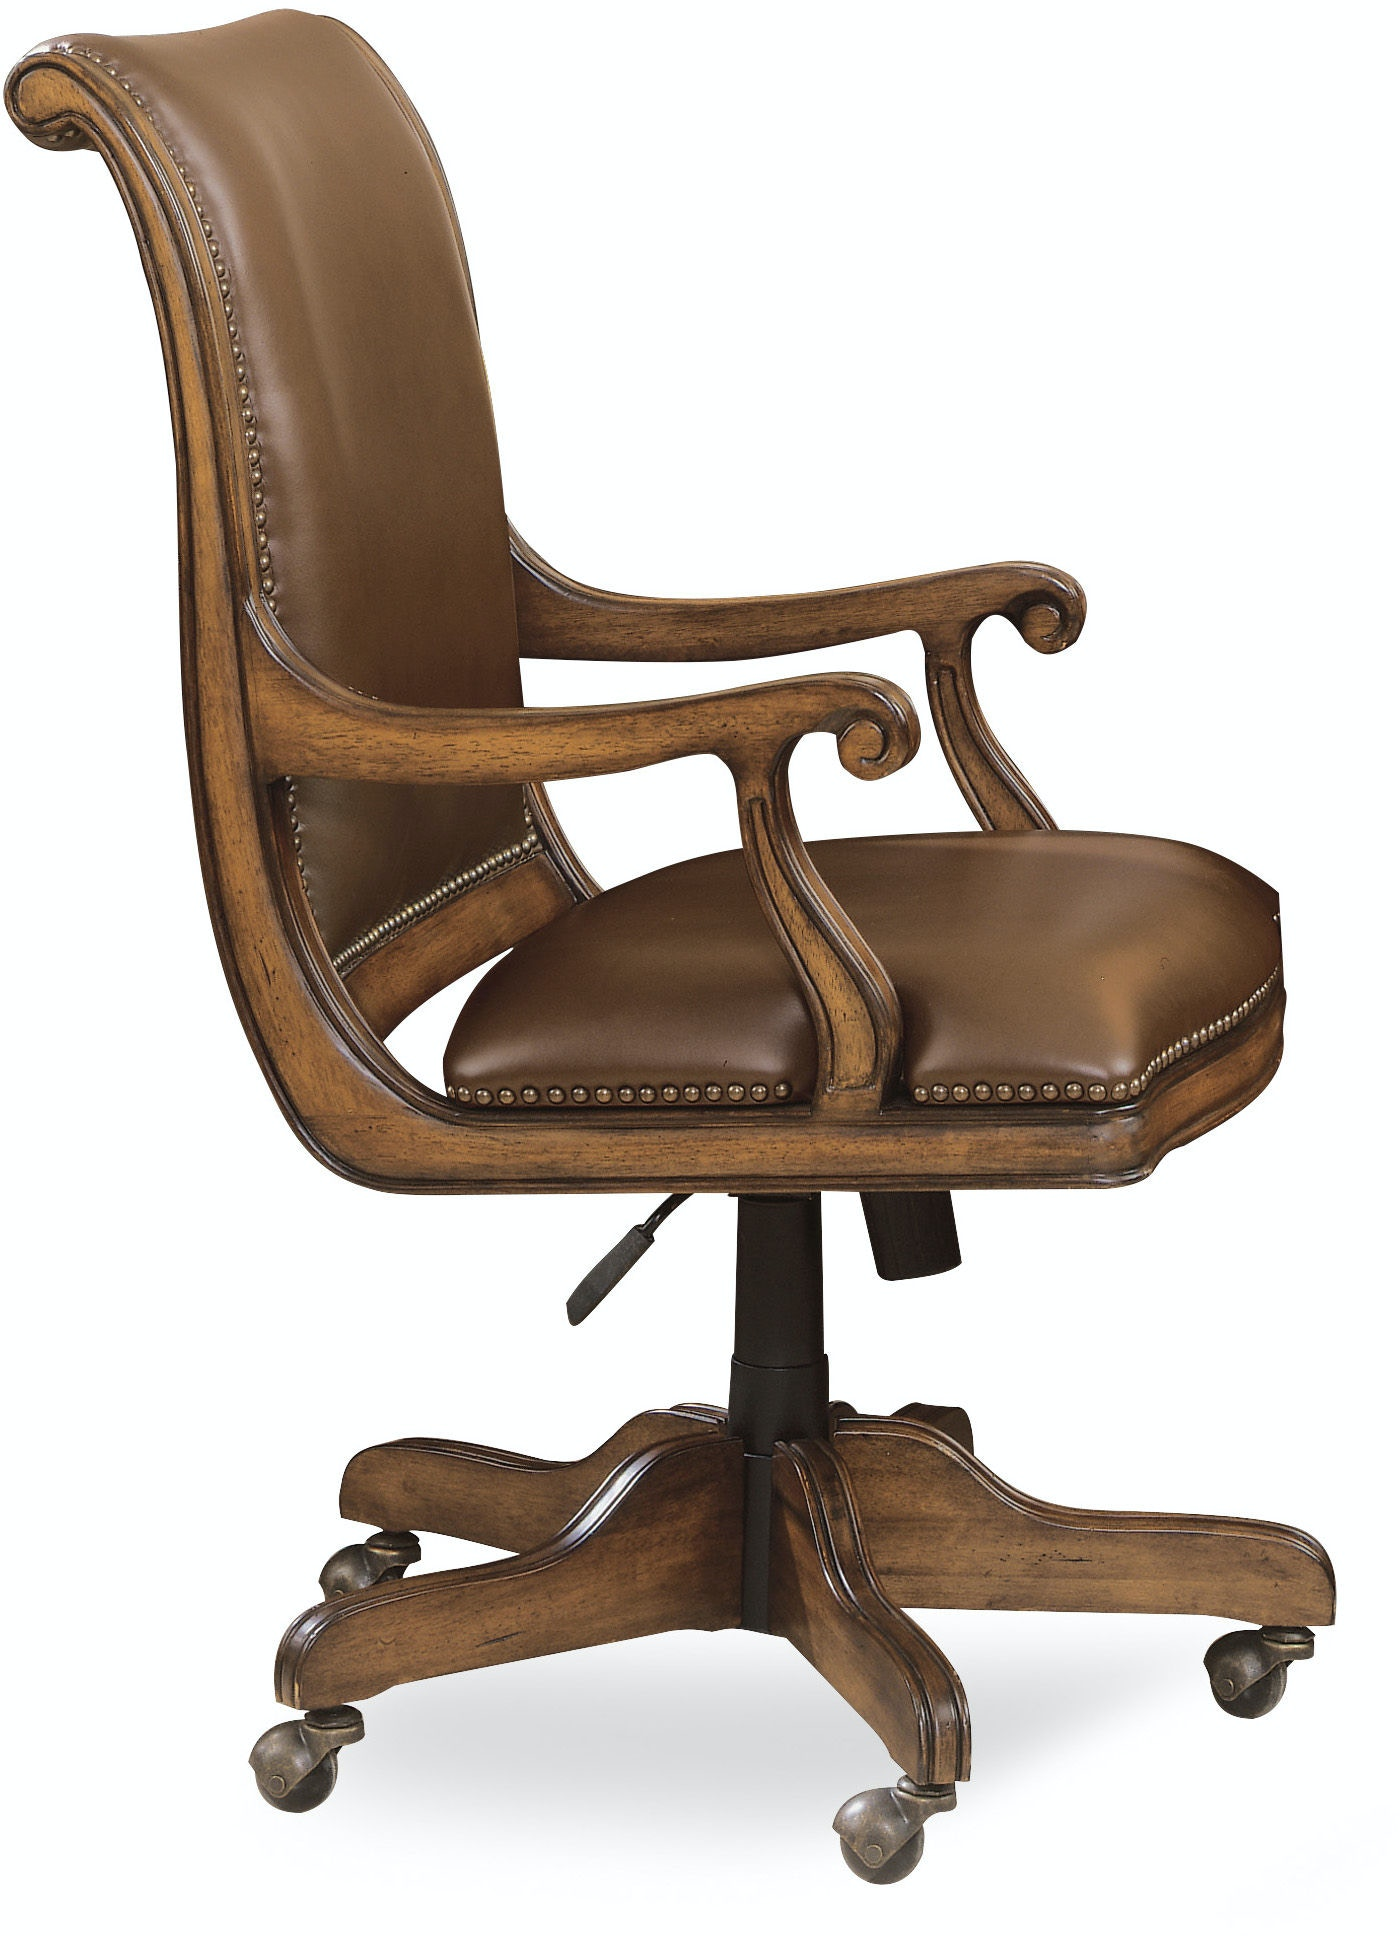 hooker furniture home office brookhaven desk chair 281-30-220